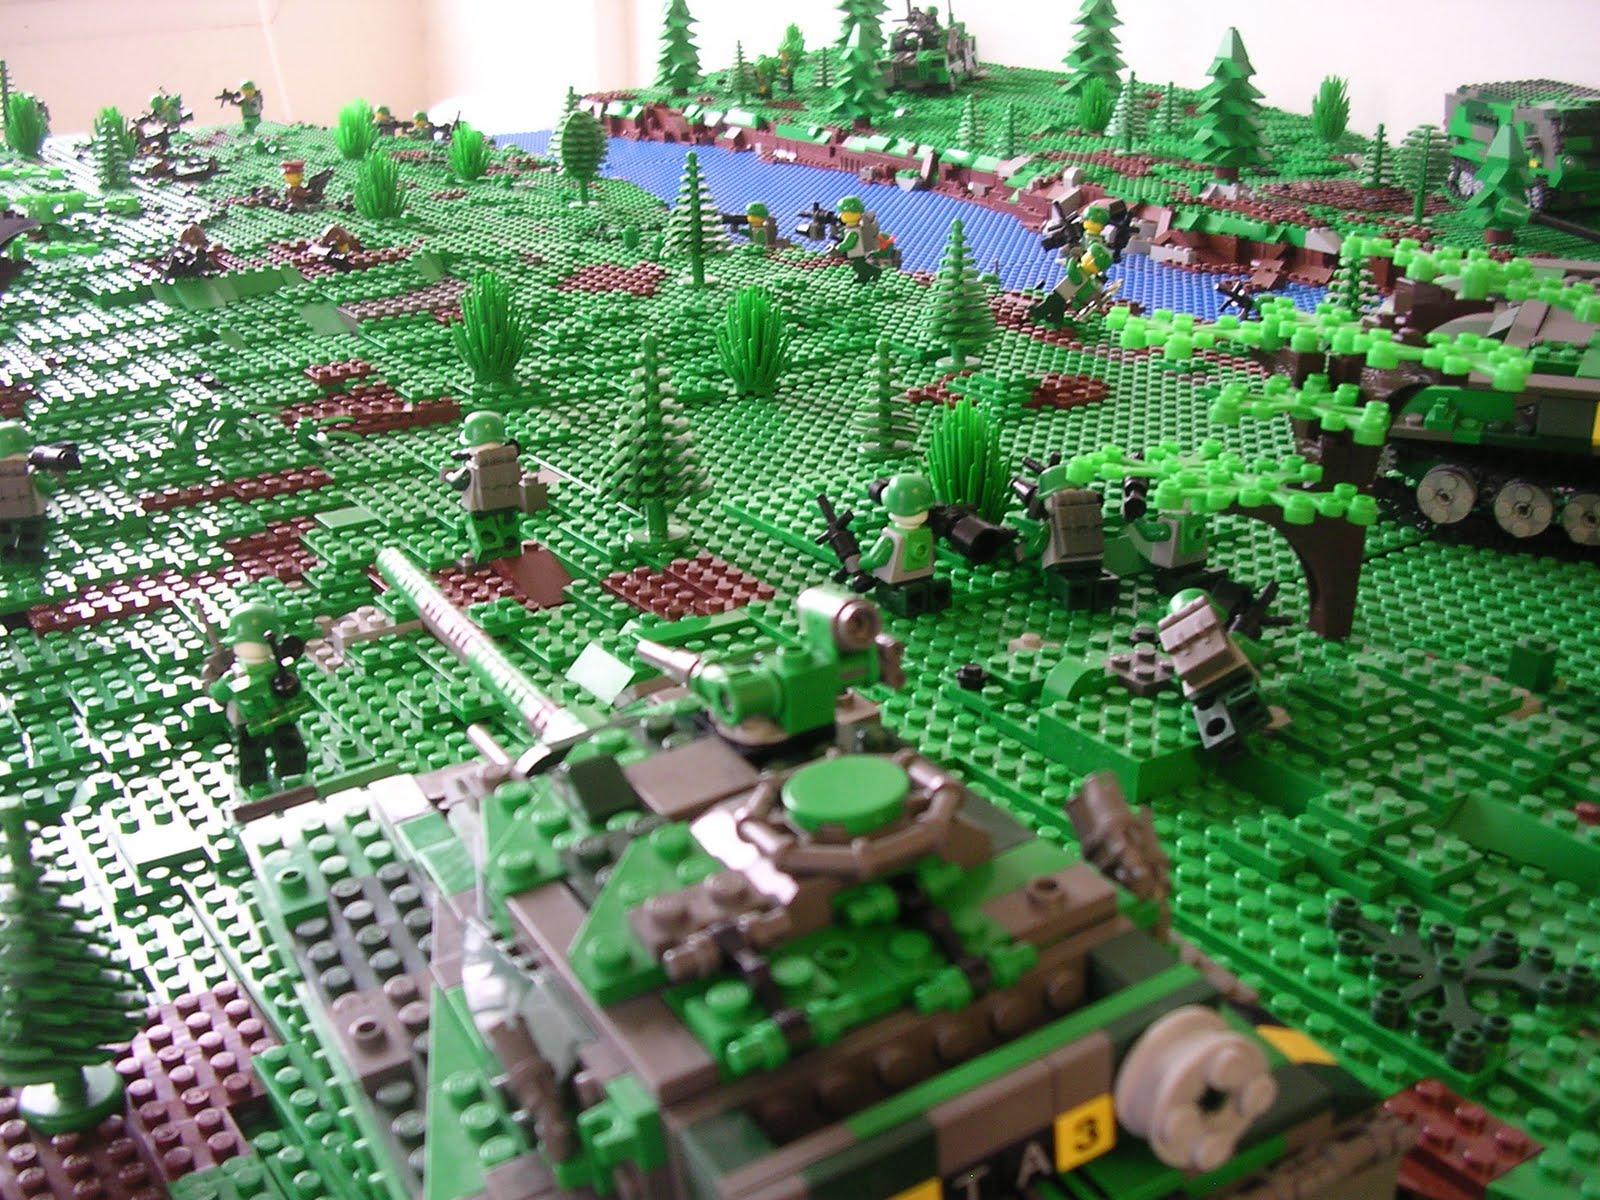 LEGO Military Models Modular Landscaping And BrickFair